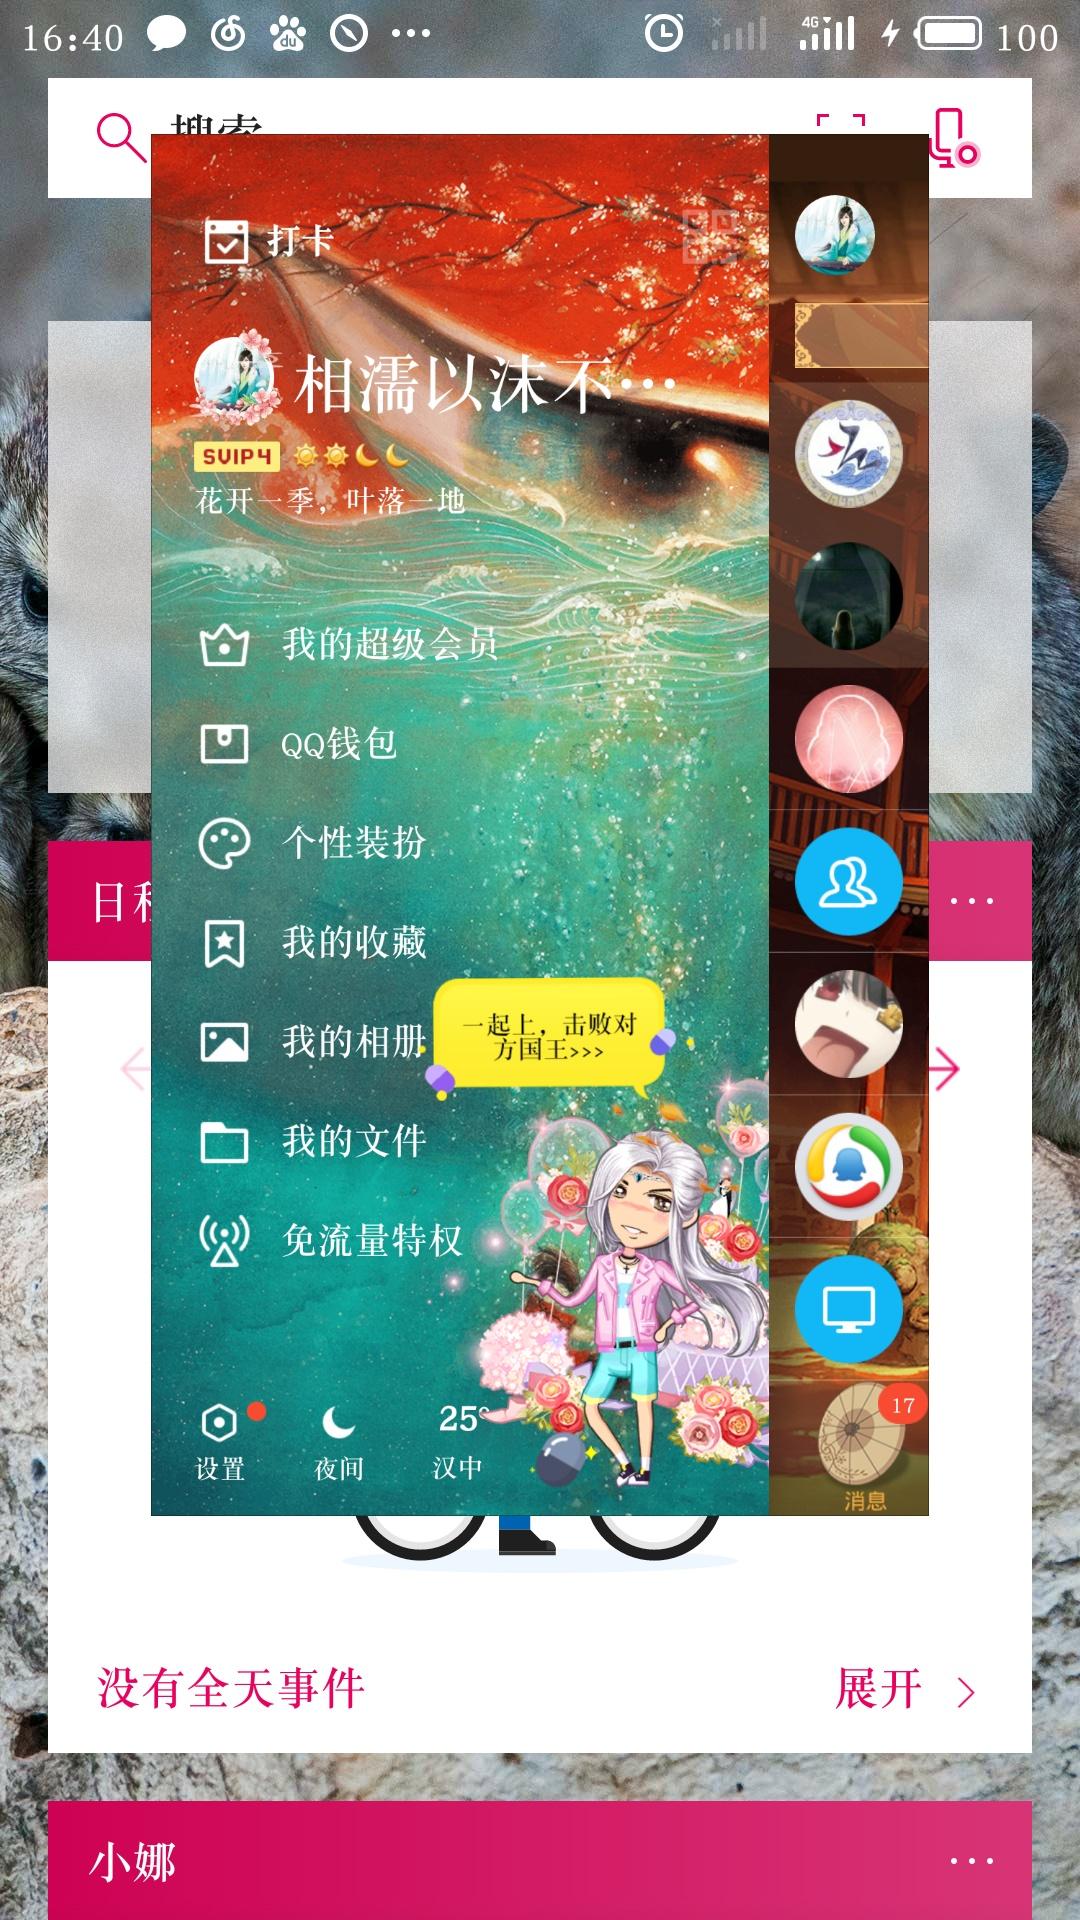 S80519-164042.jpg